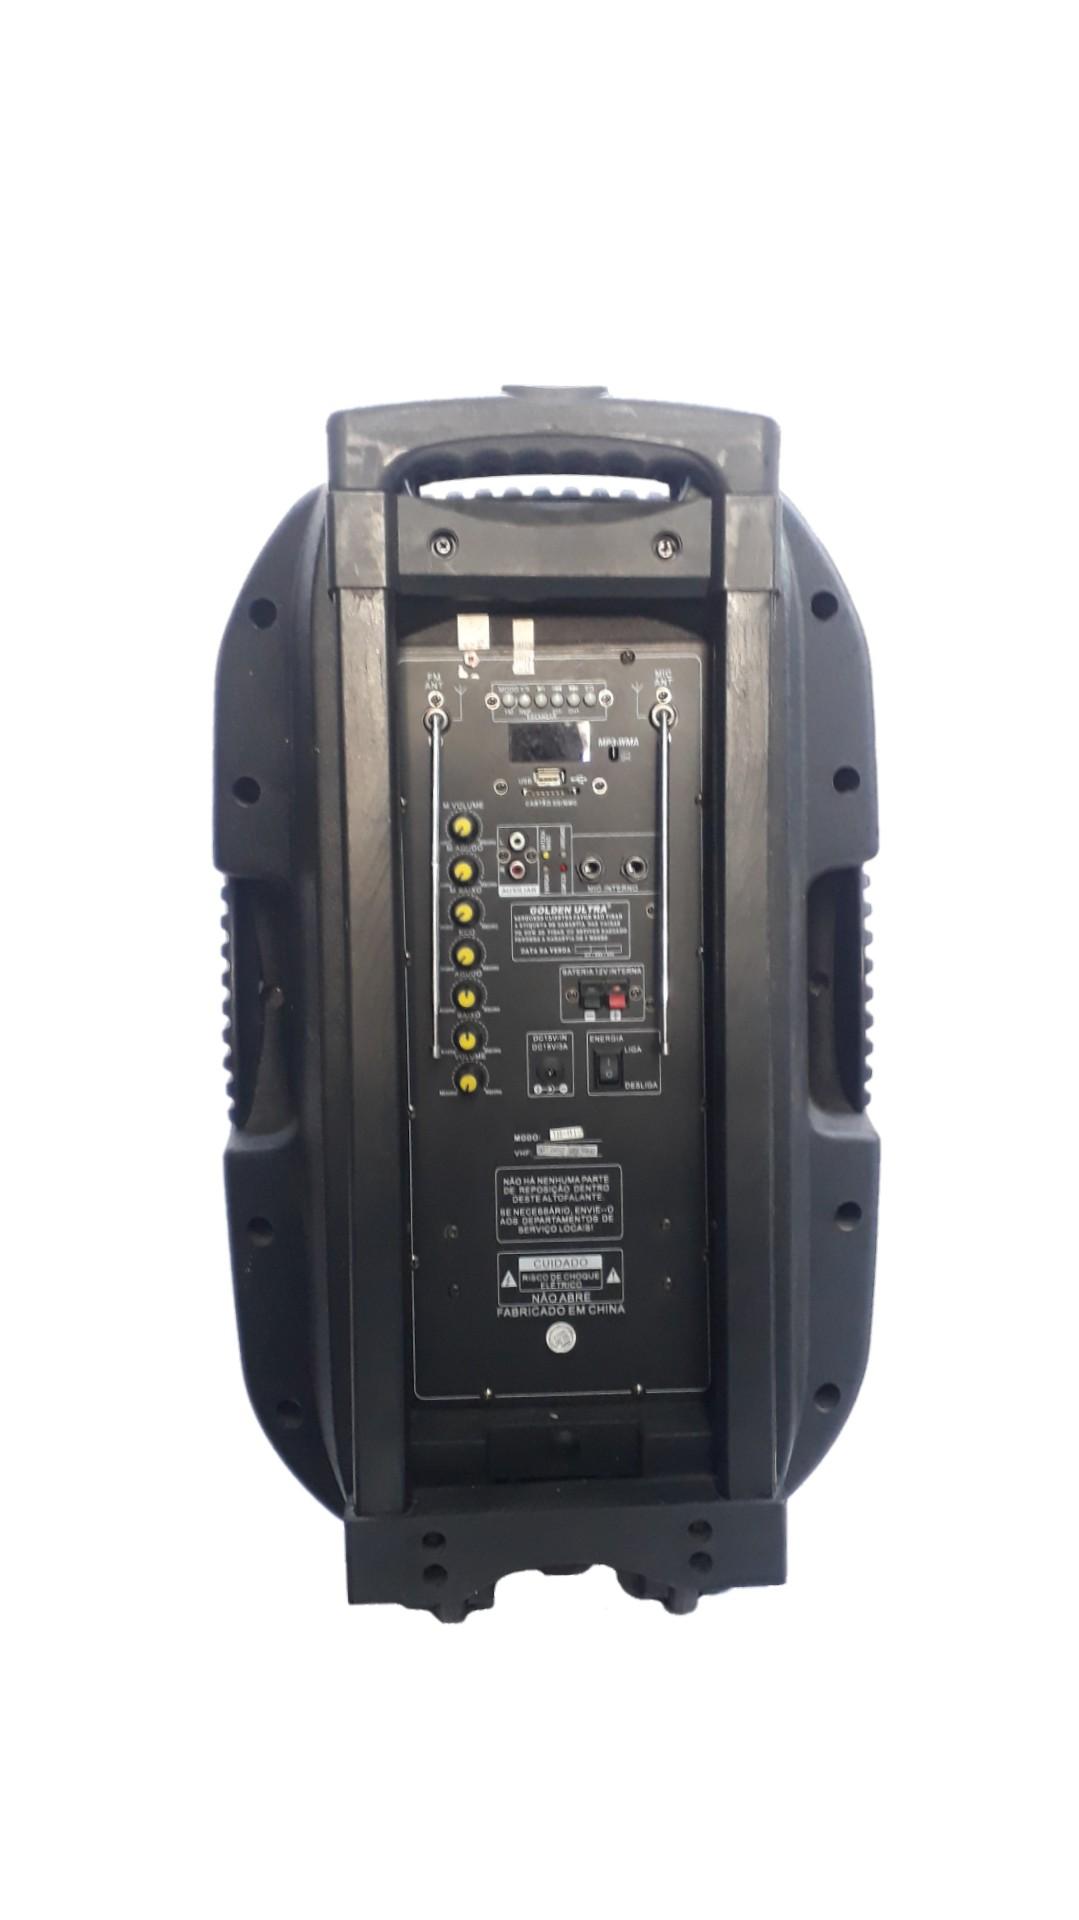 Caixa Amplificada  Golden Ultra 12´Ihb12 Usb2microfones s/Fio Fm Eco Bateria 12v Roda Ativa Controle Remoto